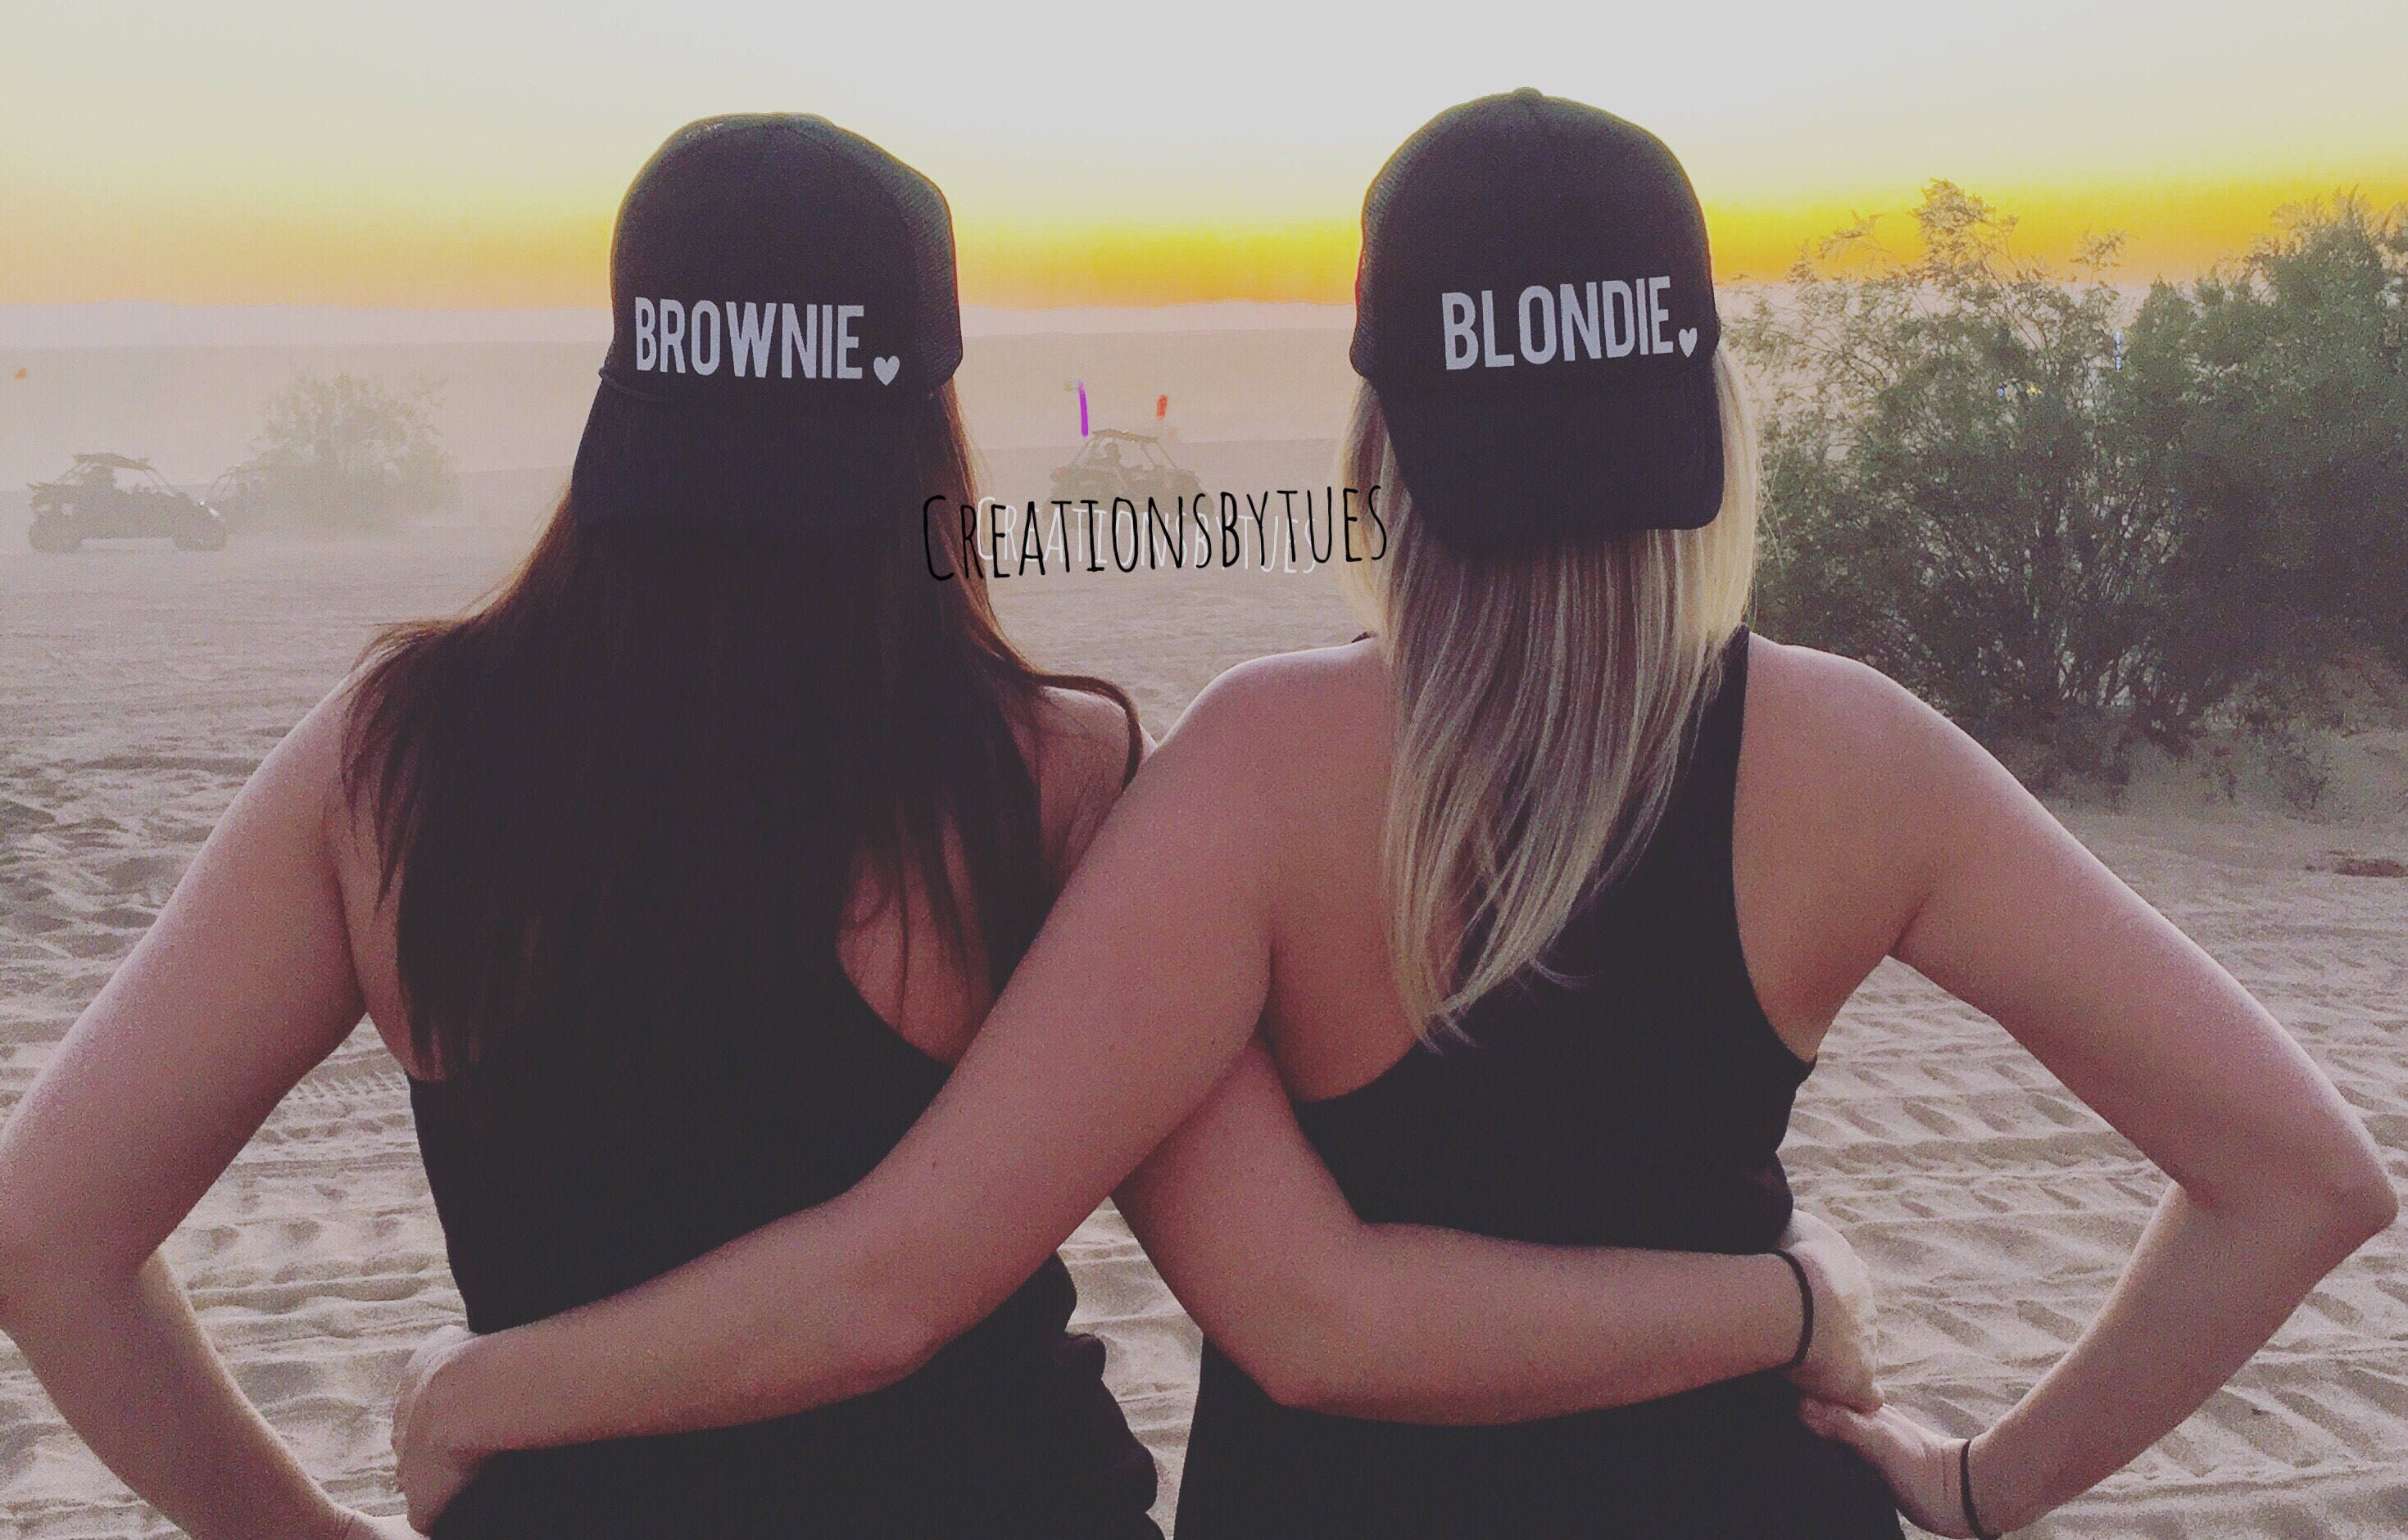 fd5608a411651 Blondie Brownie Blondie Brownie hats Best Friend Hats